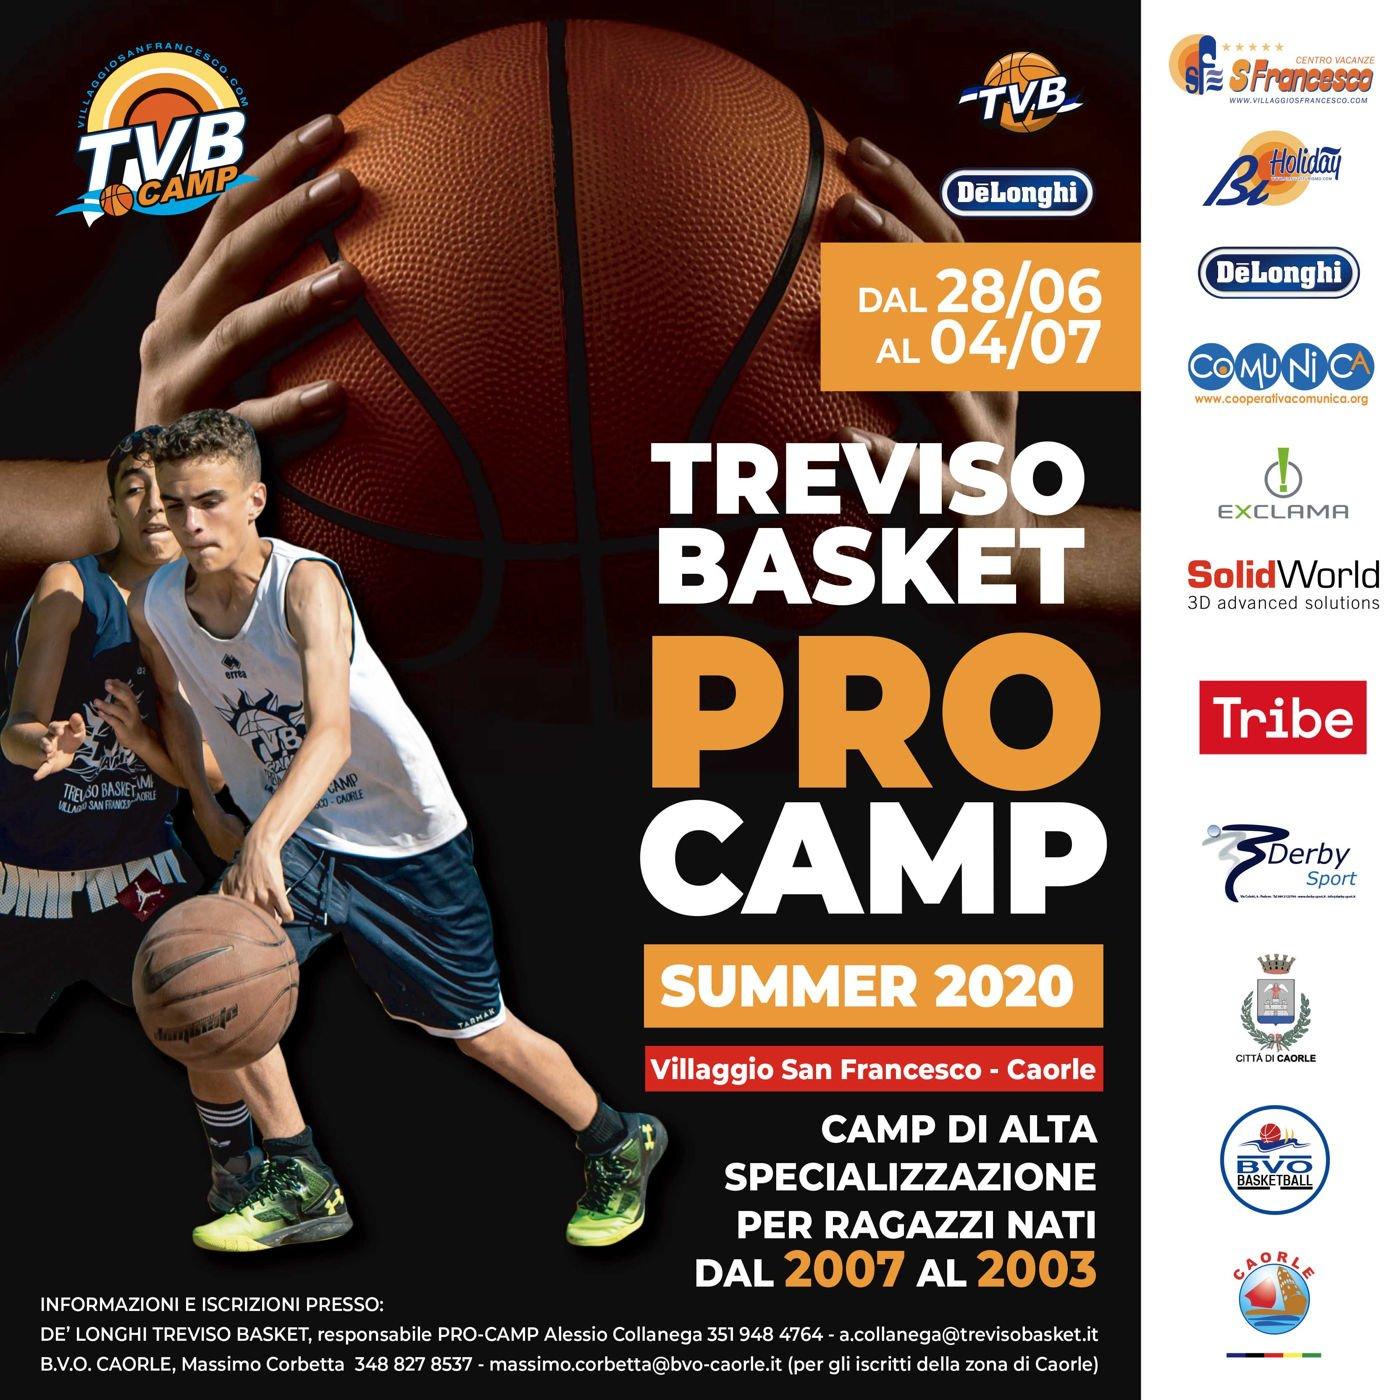 TVB PRO camp 2020